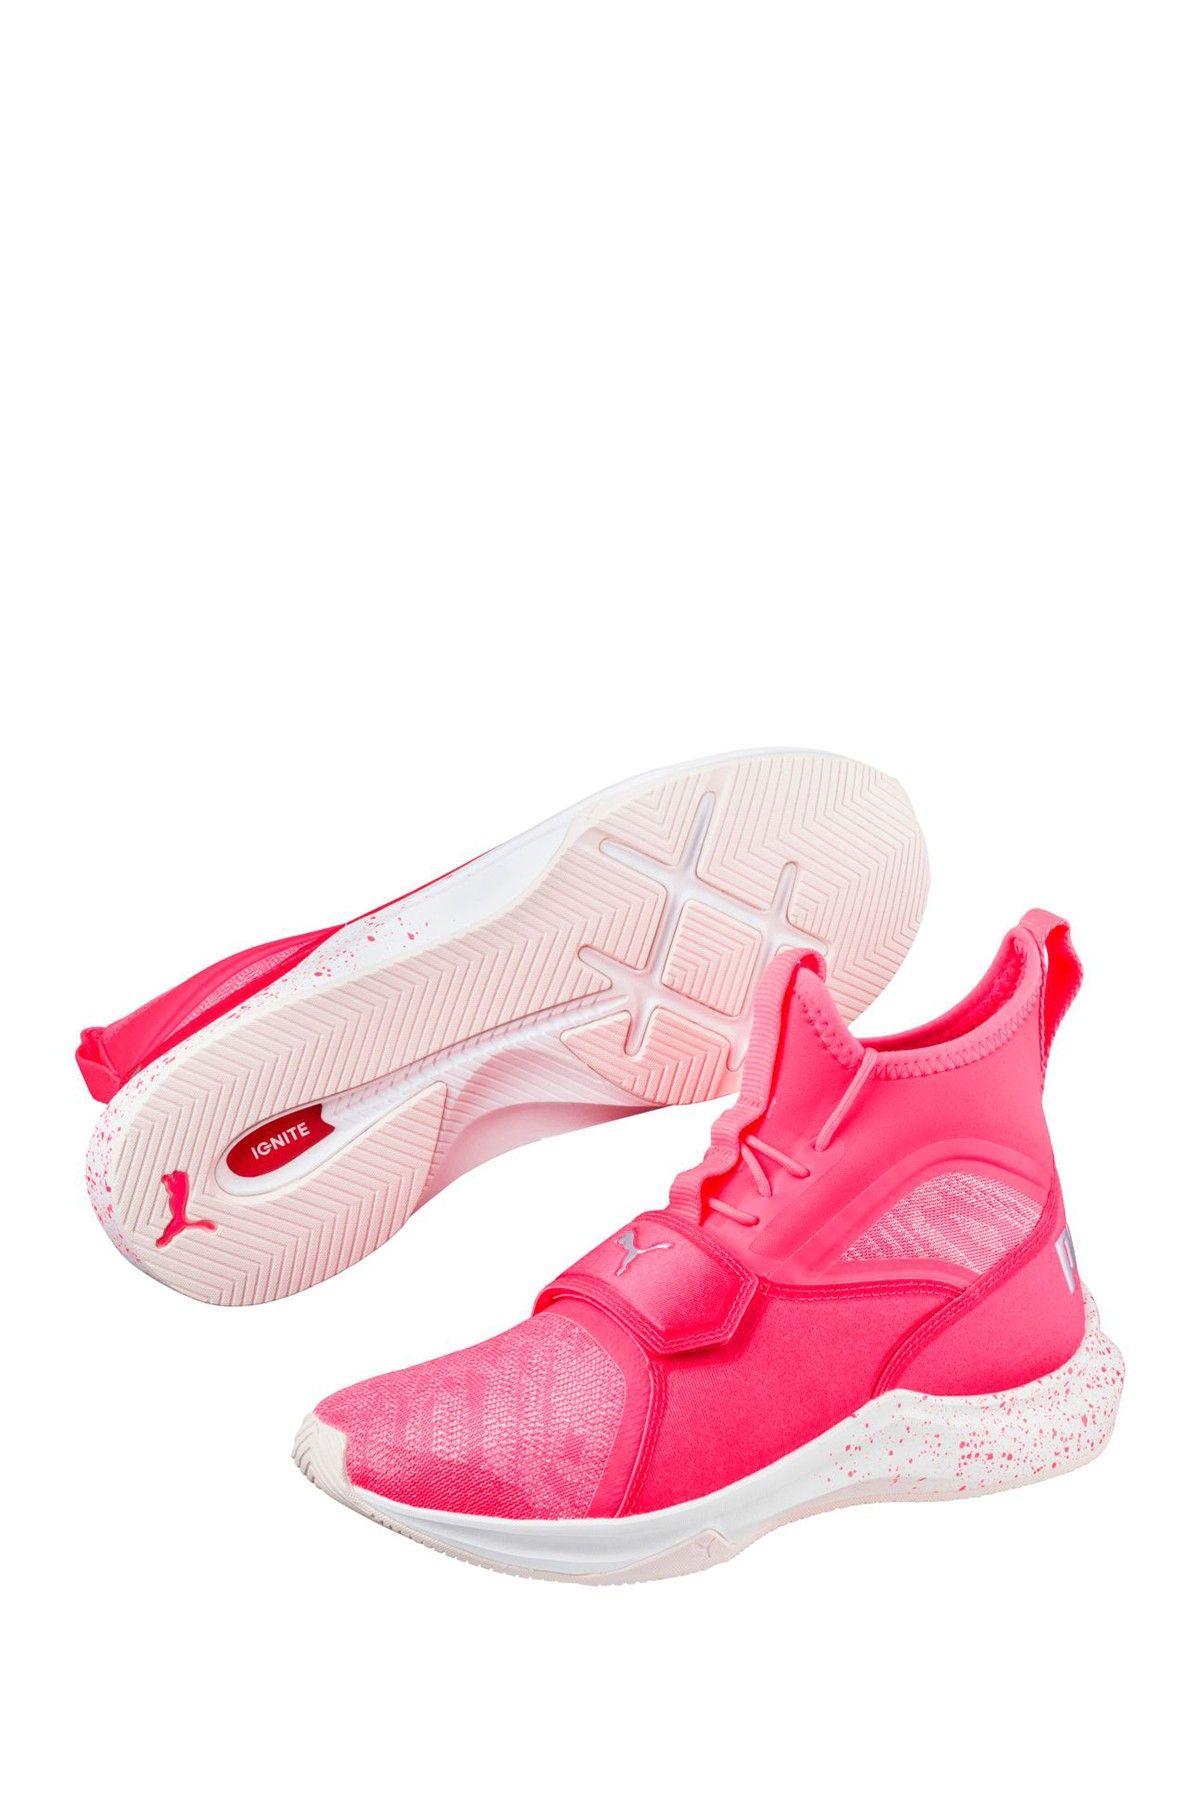 3b6674be999 Phenom Oceannaire Training Sneaker by PUMA on  nordstrom rack